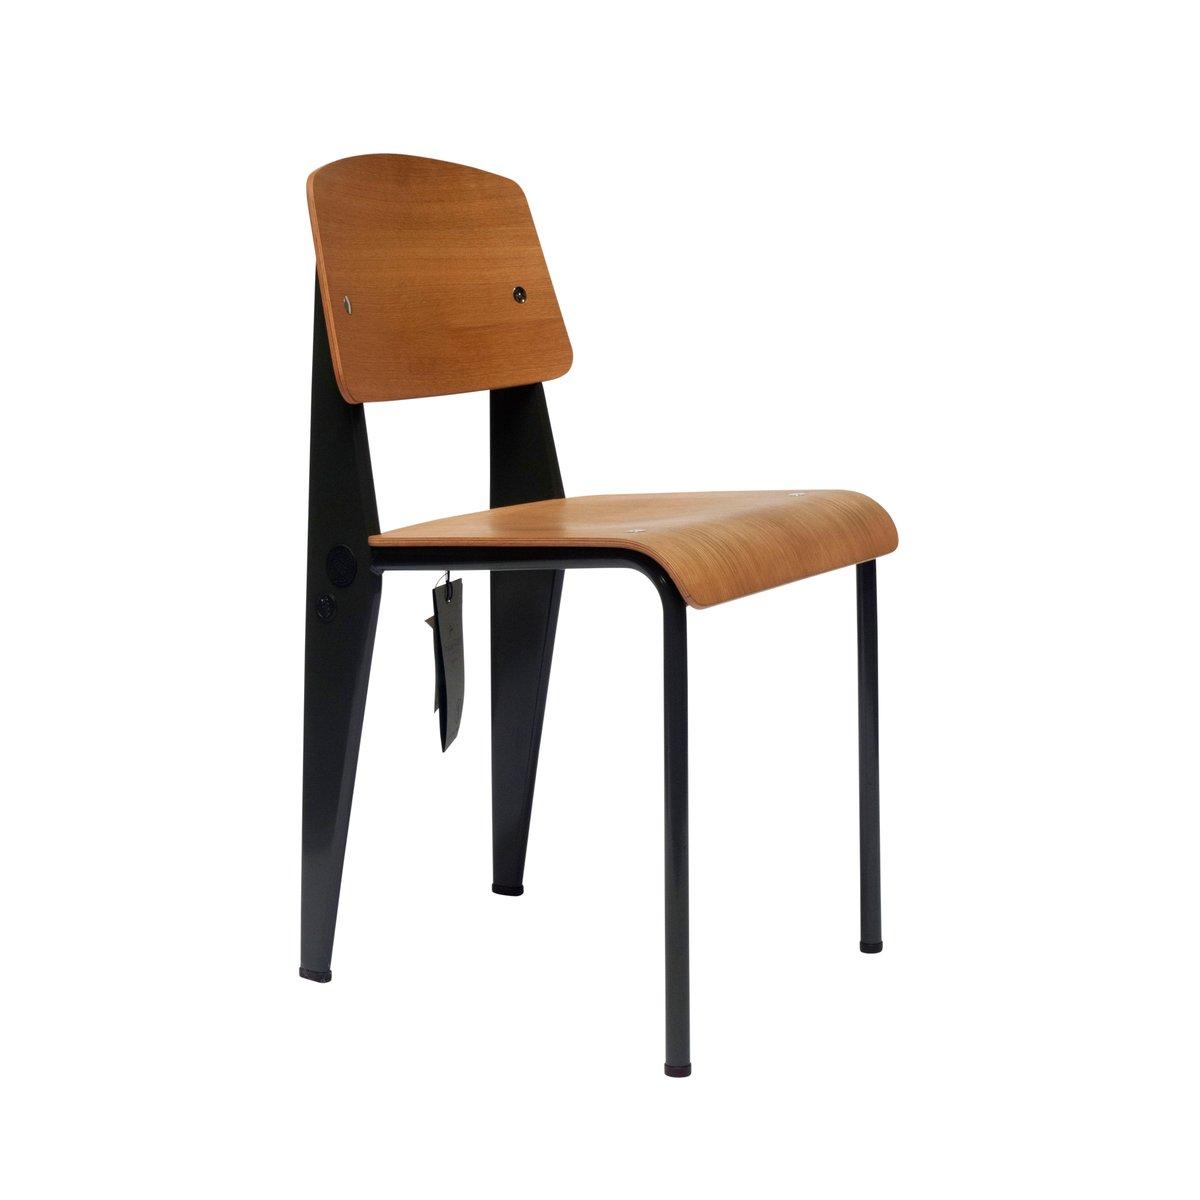 g star raw standard st hle von jean prouv f r vitra 2011 6er set bei pamono kaufen. Black Bedroom Furniture Sets. Home Design Ideas